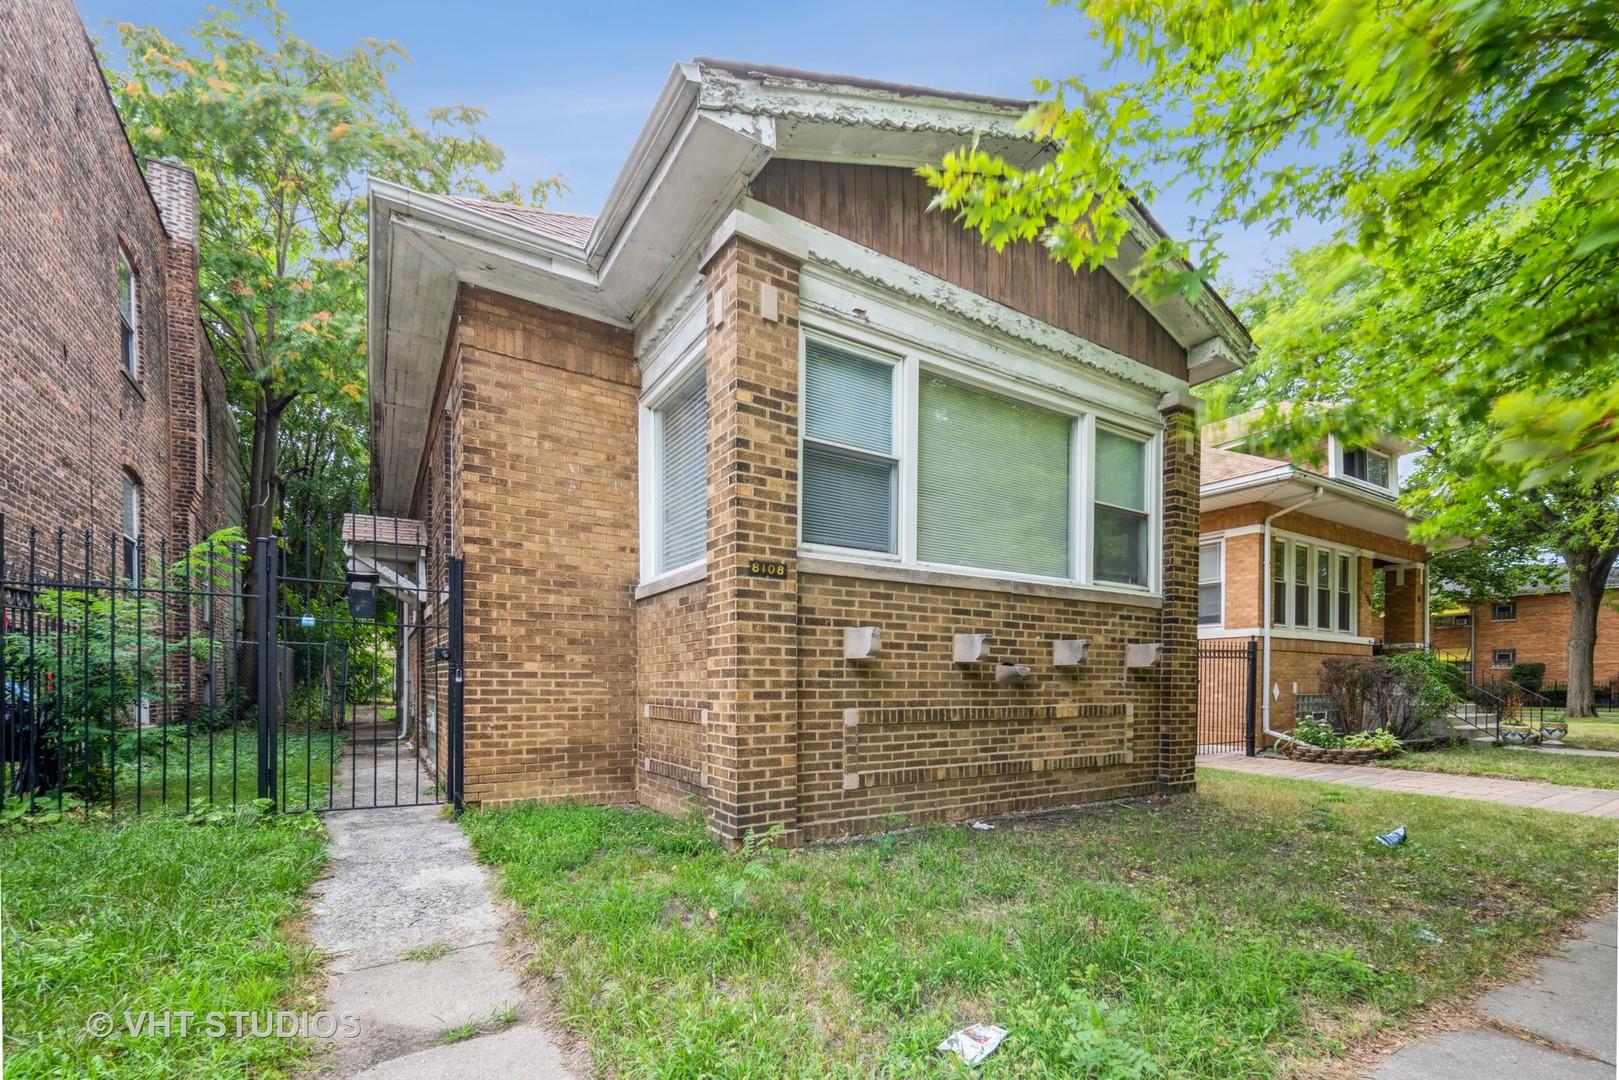 8108 S Manistee Avenue, Chicago IL 60617